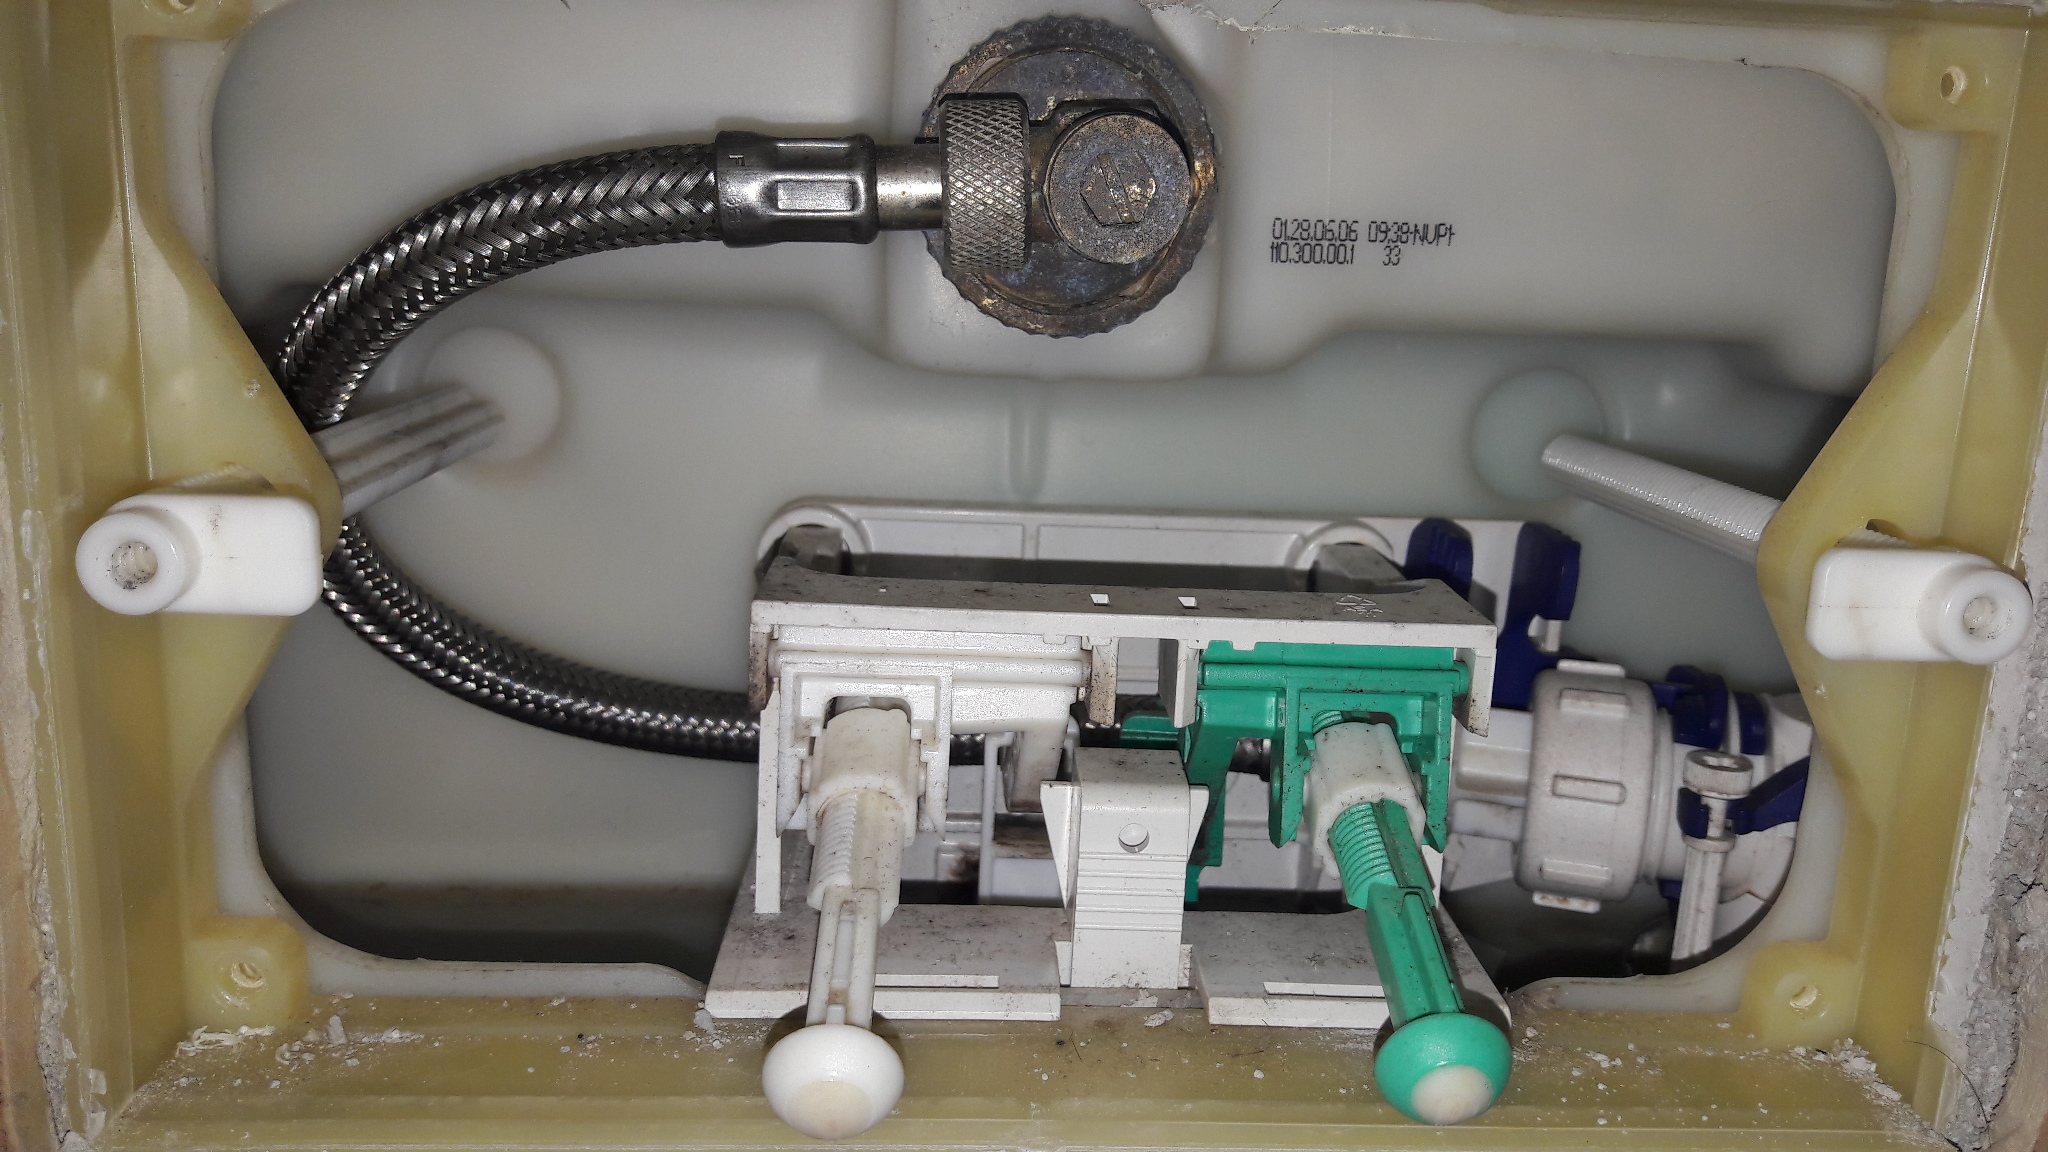 geberit wc wasser abdrehen toilette handwerker. Black Bedroom Furniture Sets. Home Design Ideas